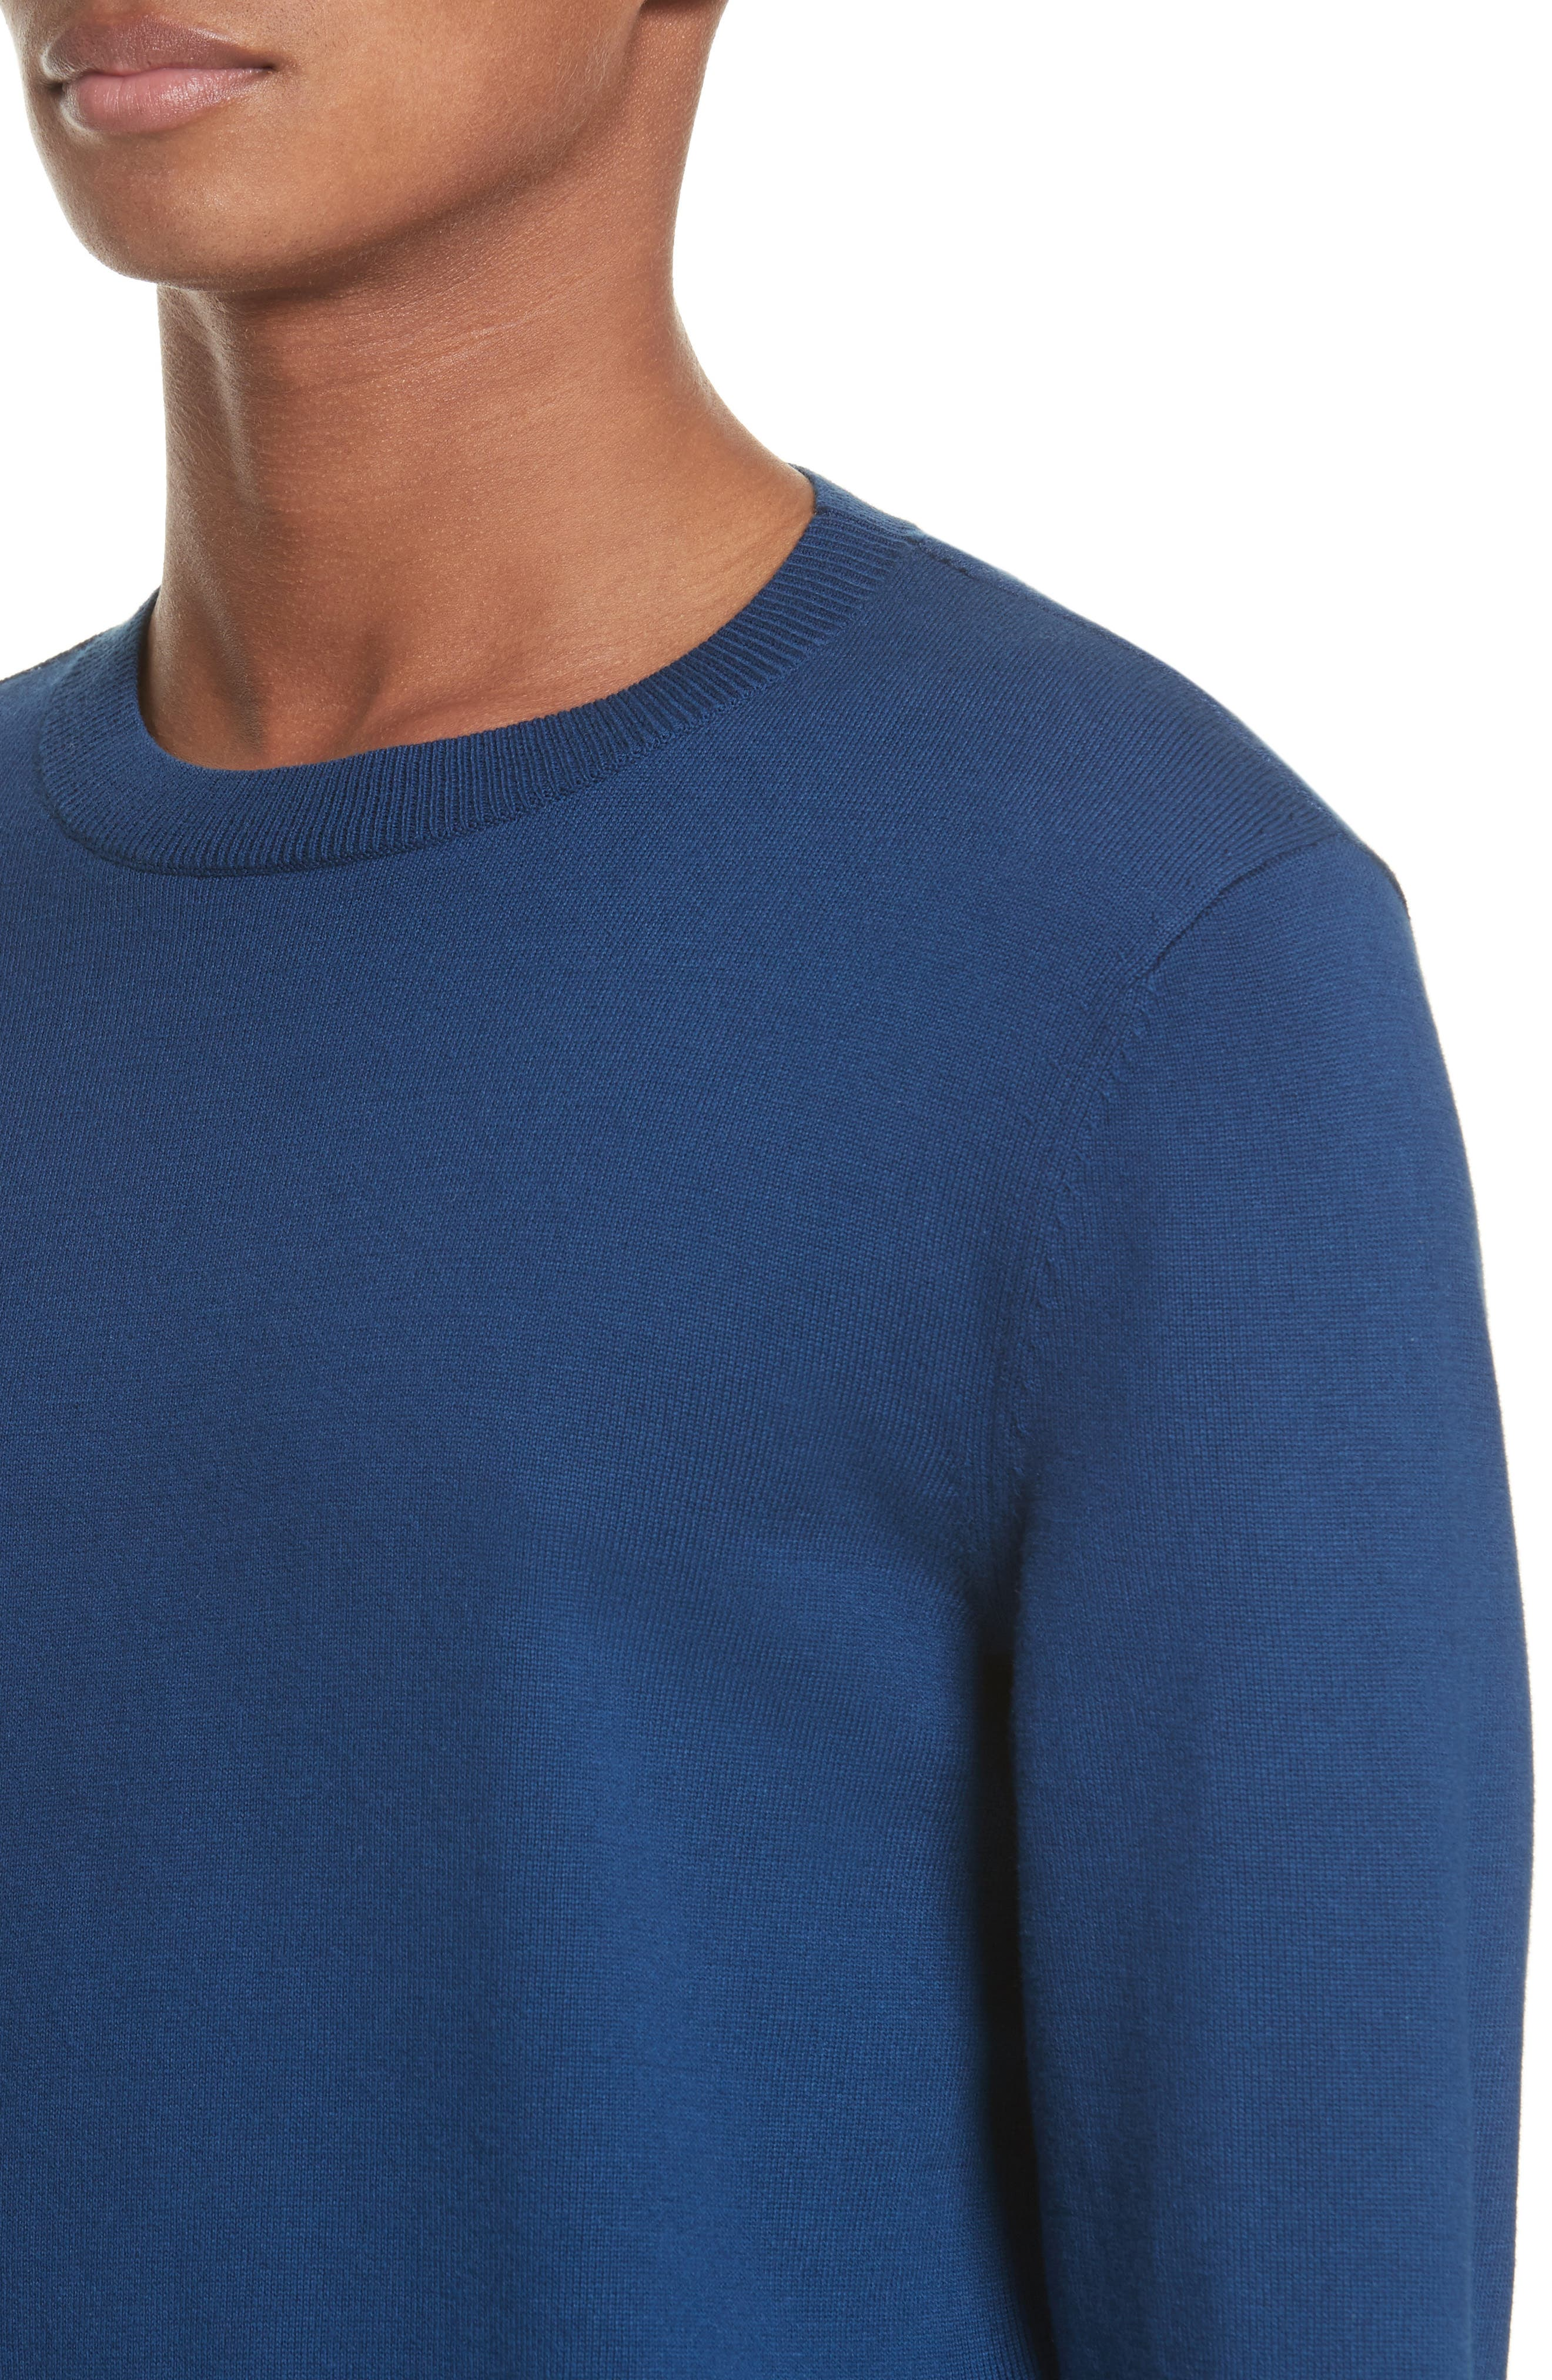 CIA Crewneck Sweater,                             Alternate thumbnail 4, color,                             401